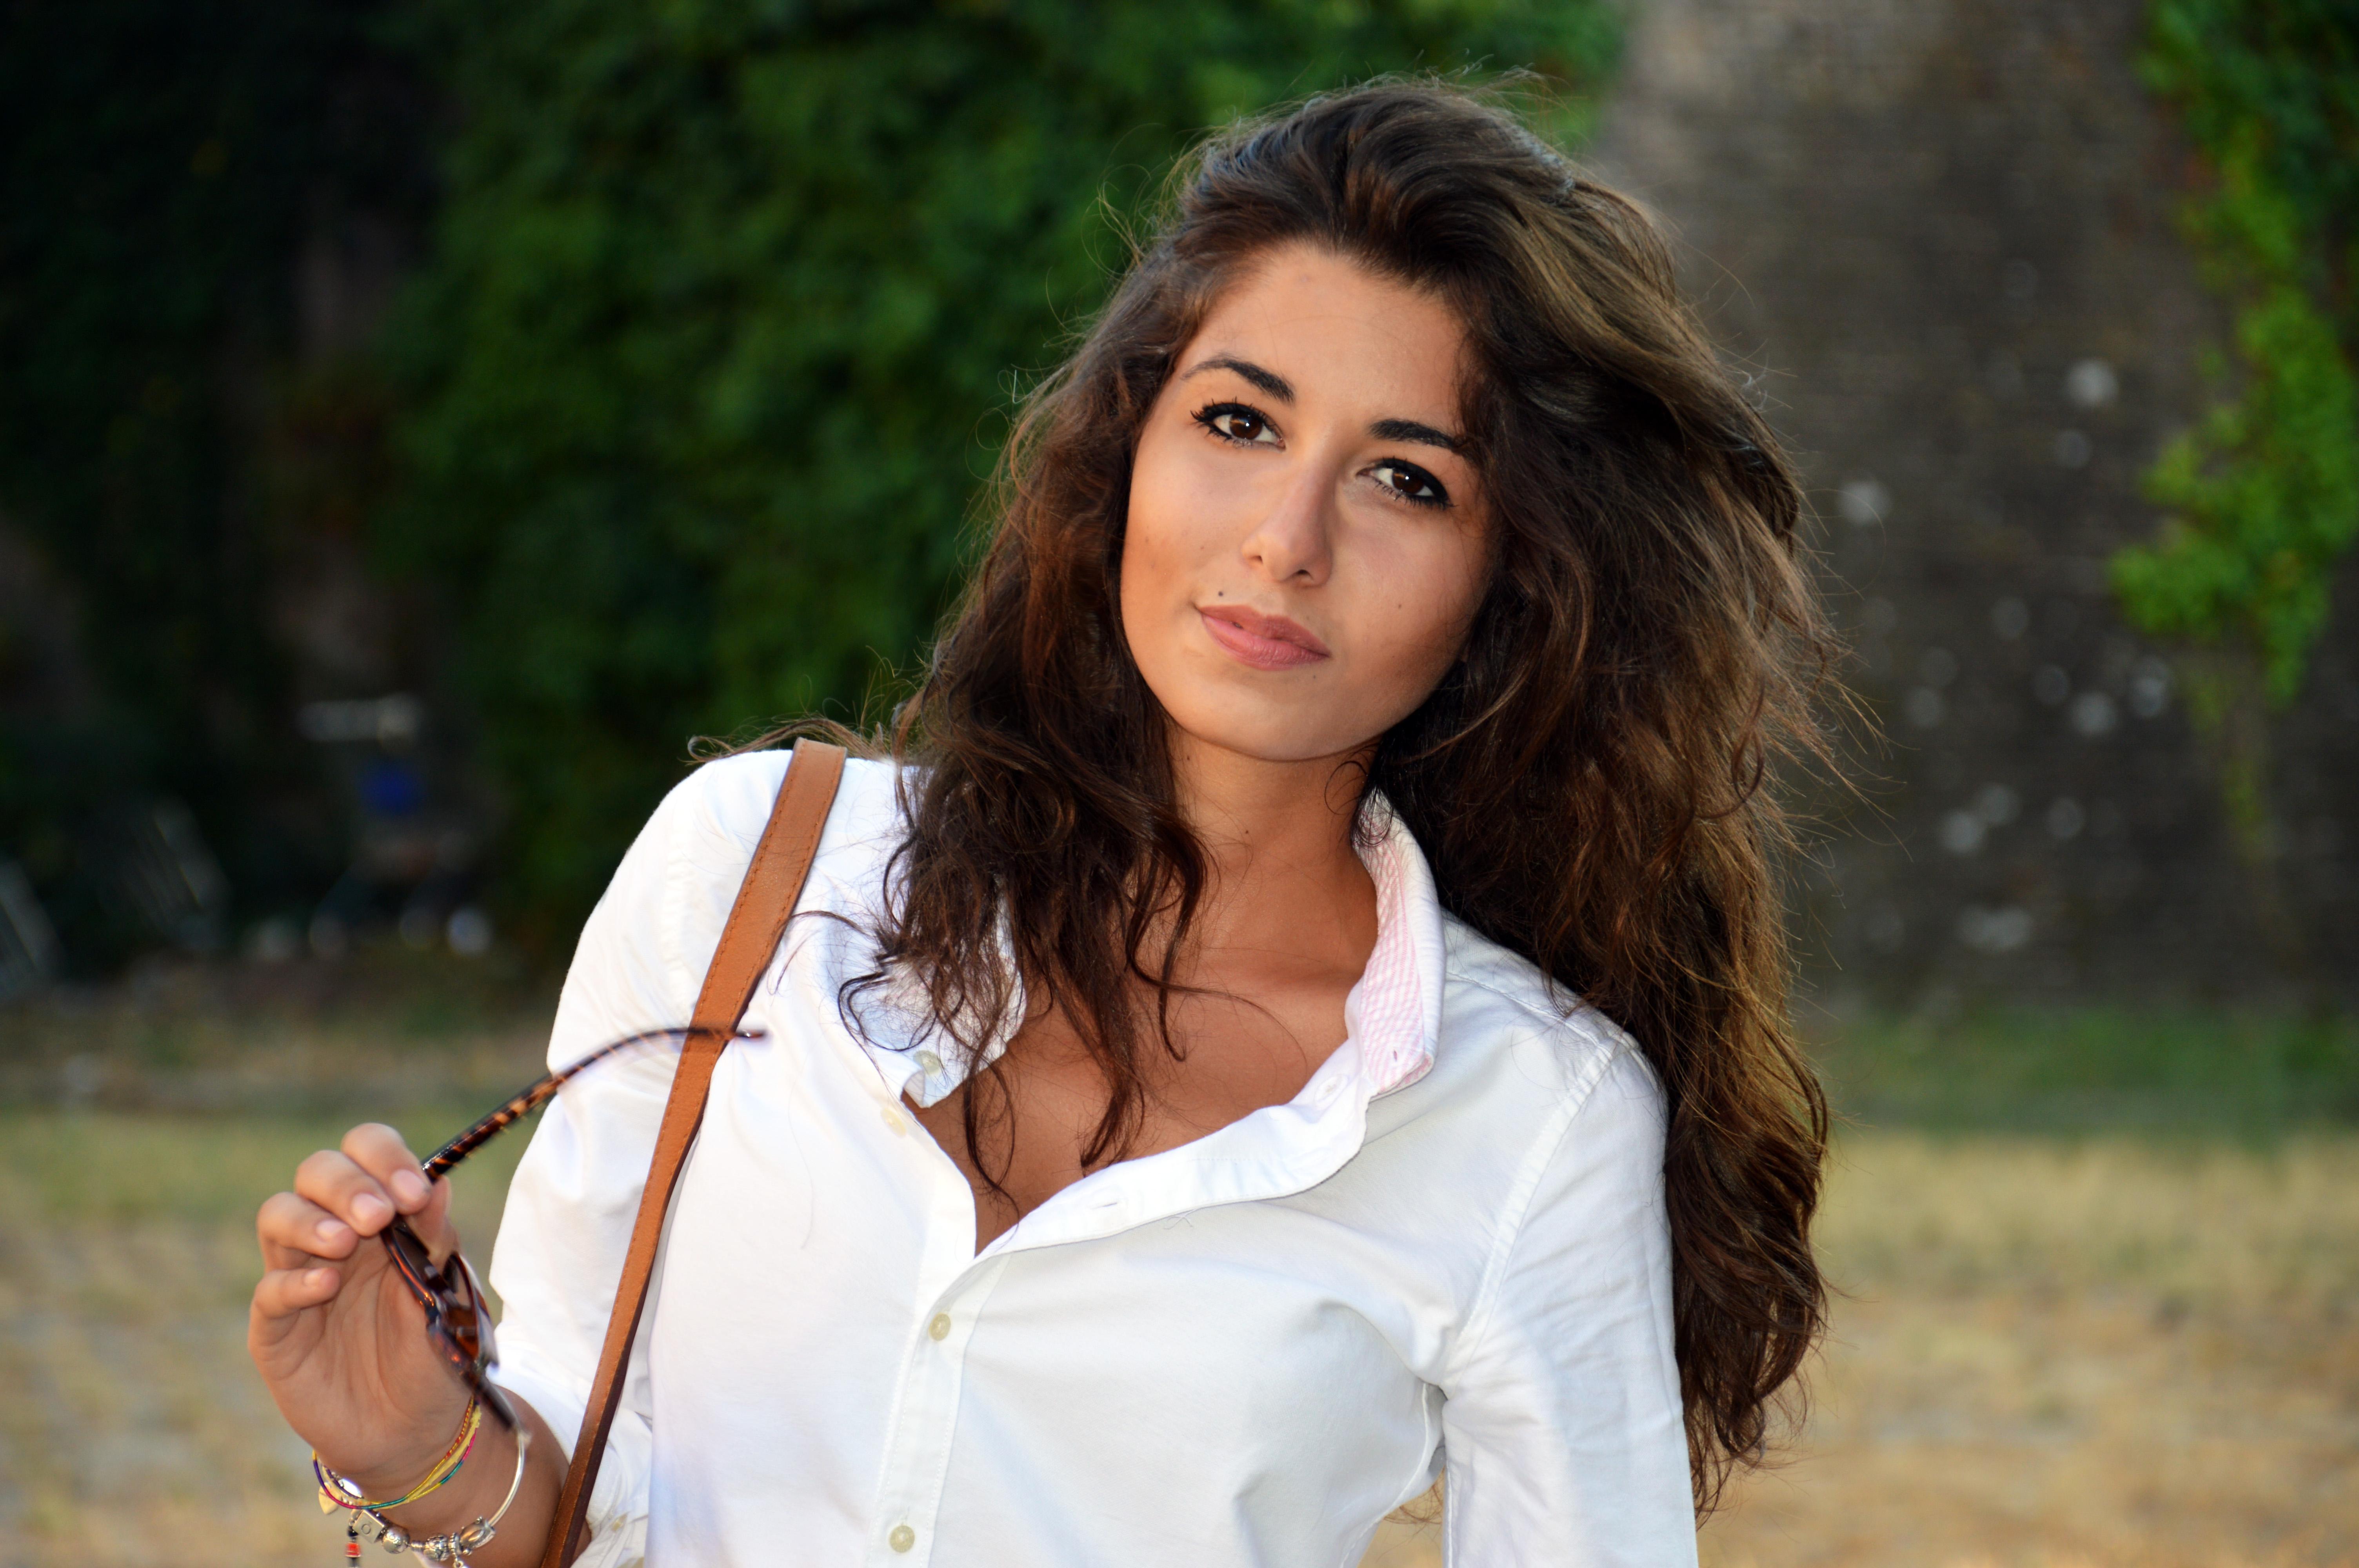 Fabrizia Capanna